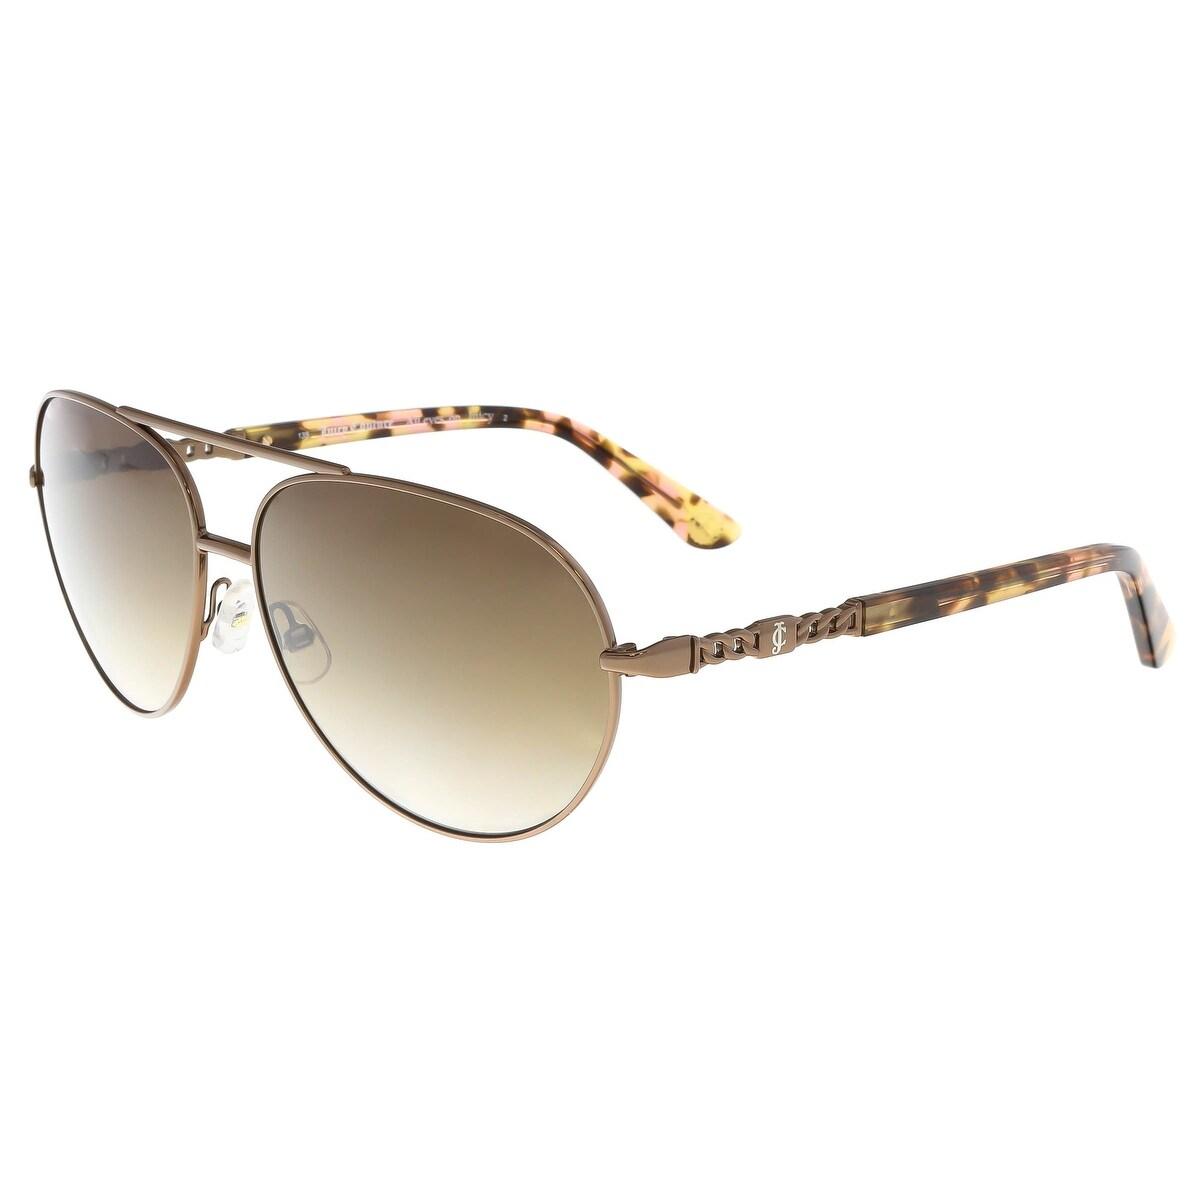 d9371048f859 Shop Juicy Couture - Juicy 582/S 00B0 Brown Aviator Sunglasses - 58 ...